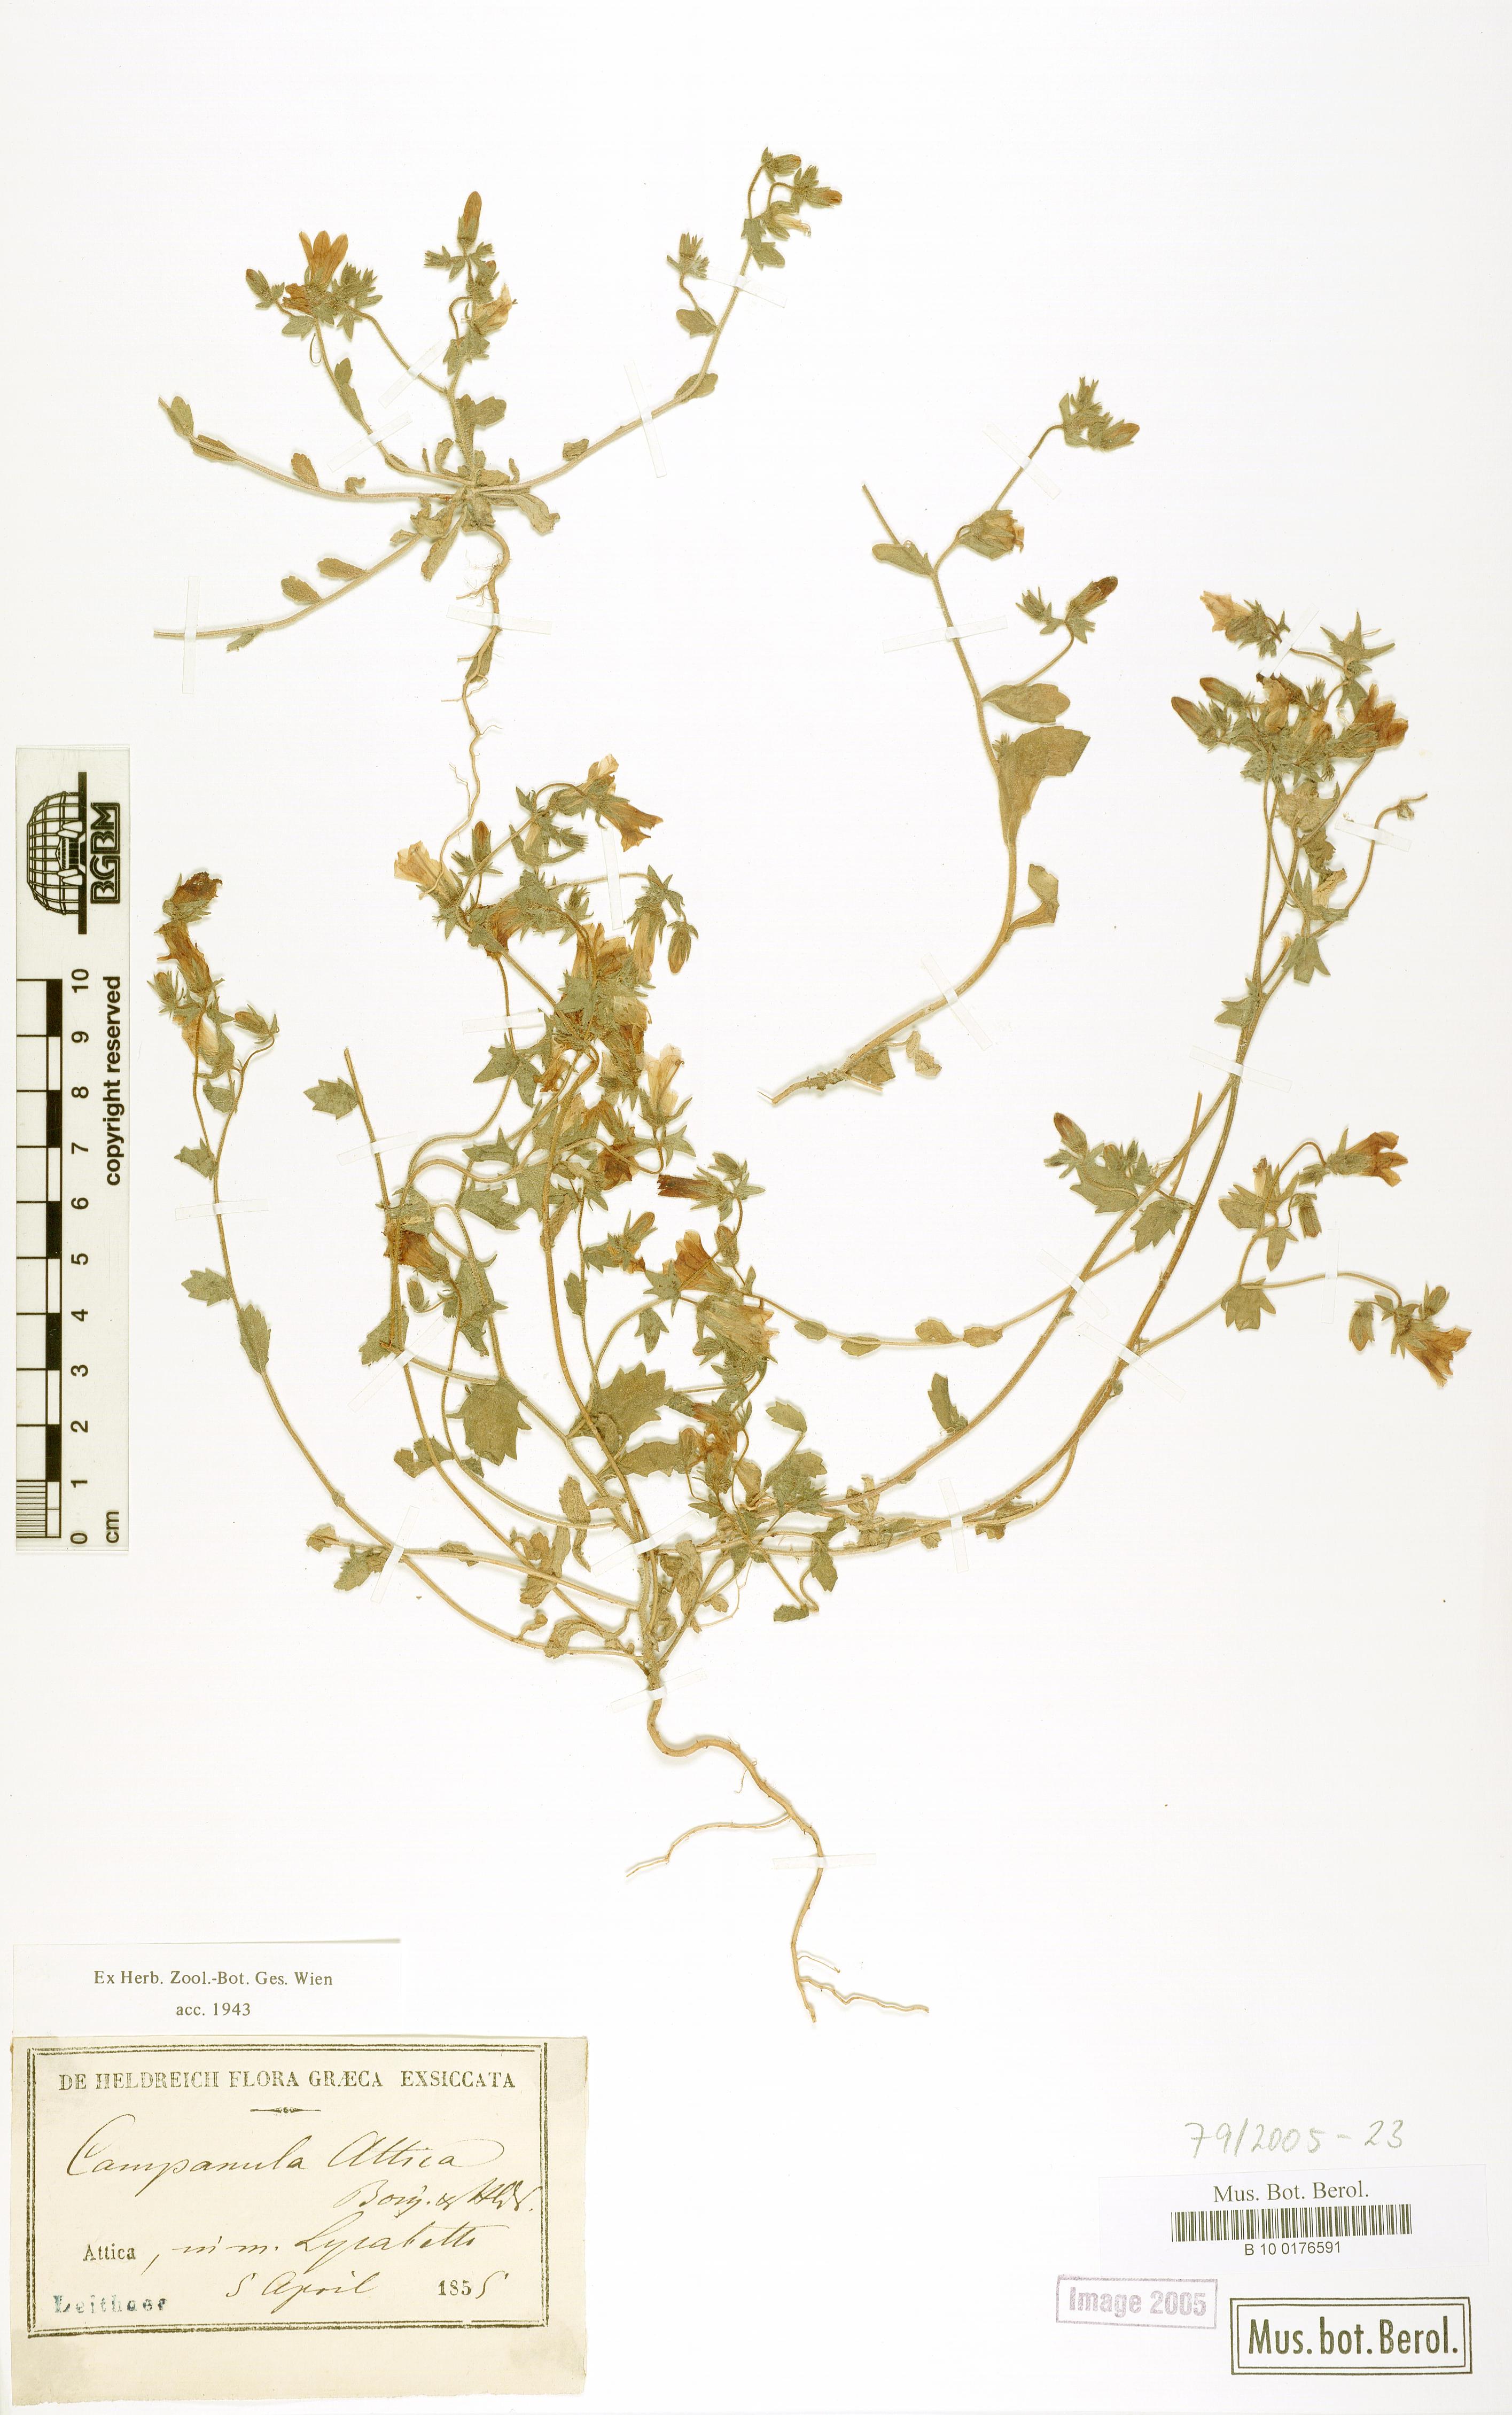 http://ww2.bgbm.org/herbarium/images/B/10/01/76/59/B_10_0176591.jpg